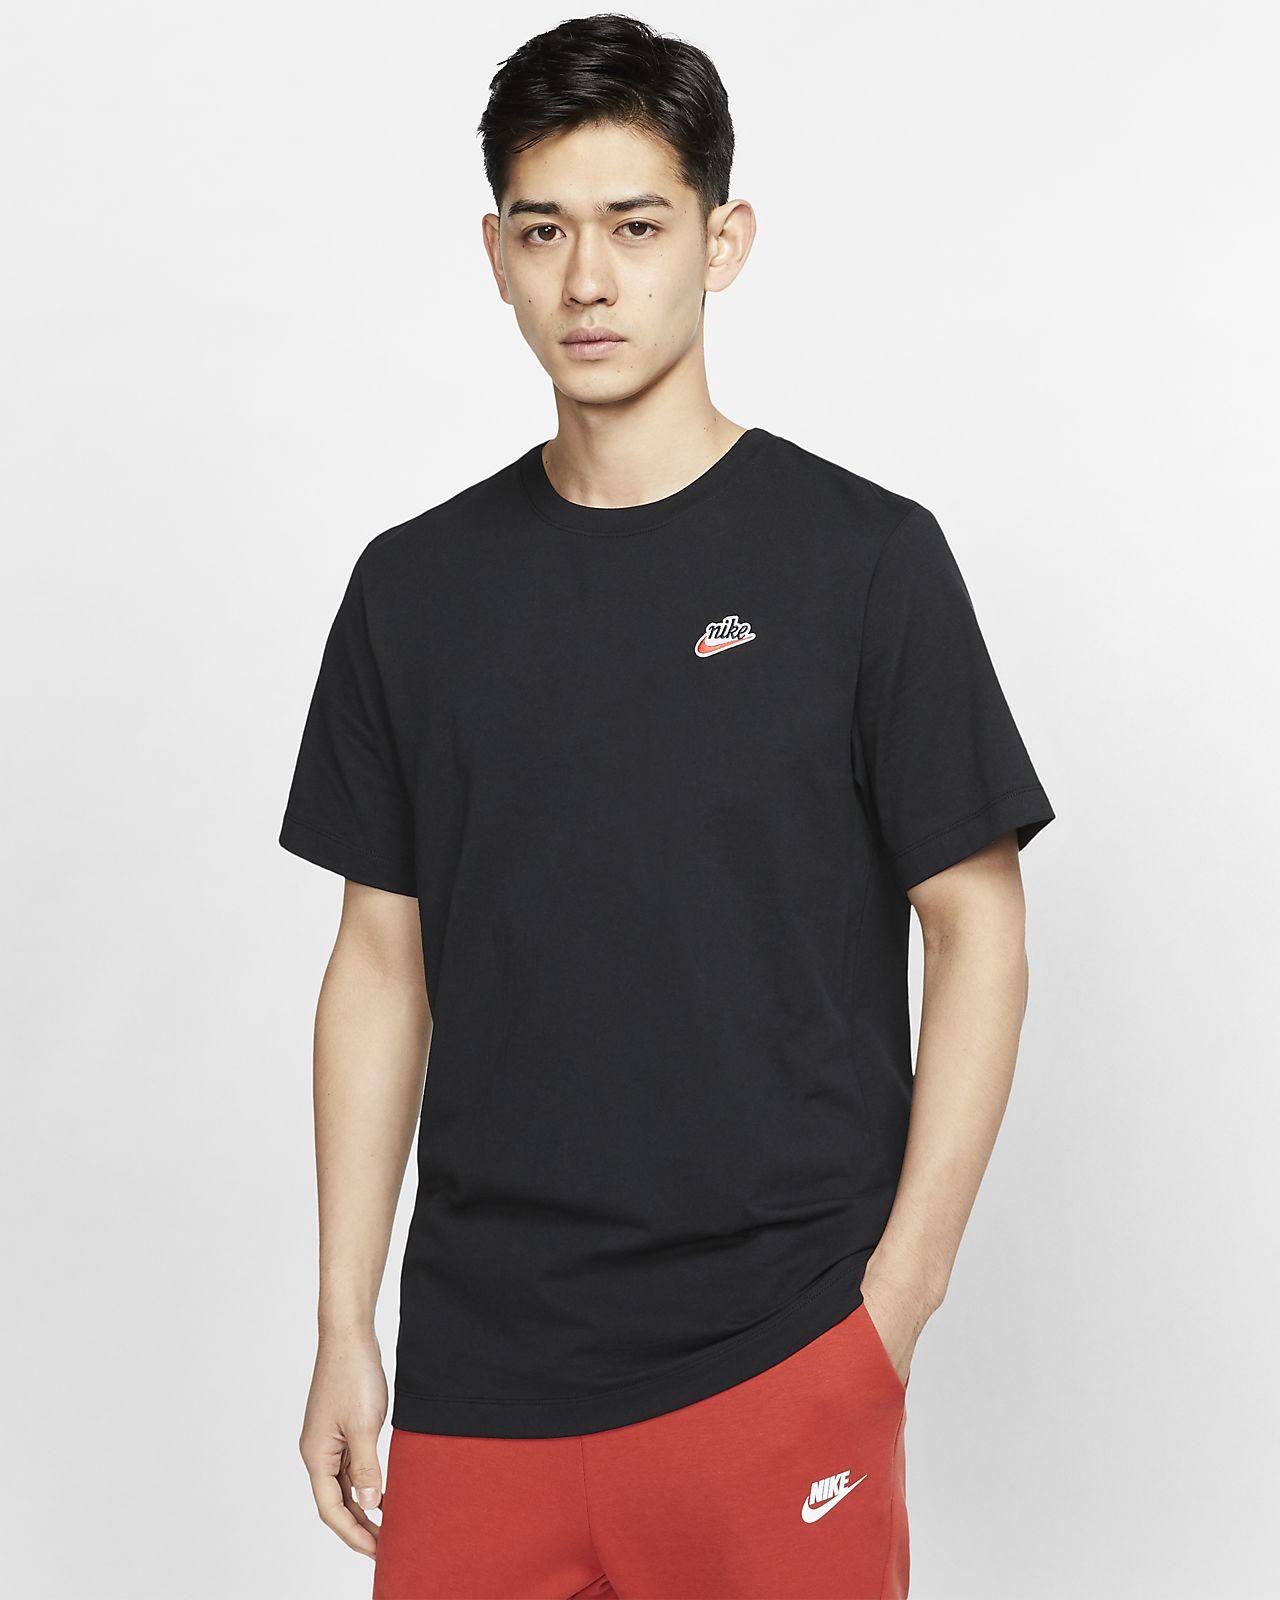 Nike Sportswear Heritage Herren-T-Shirt